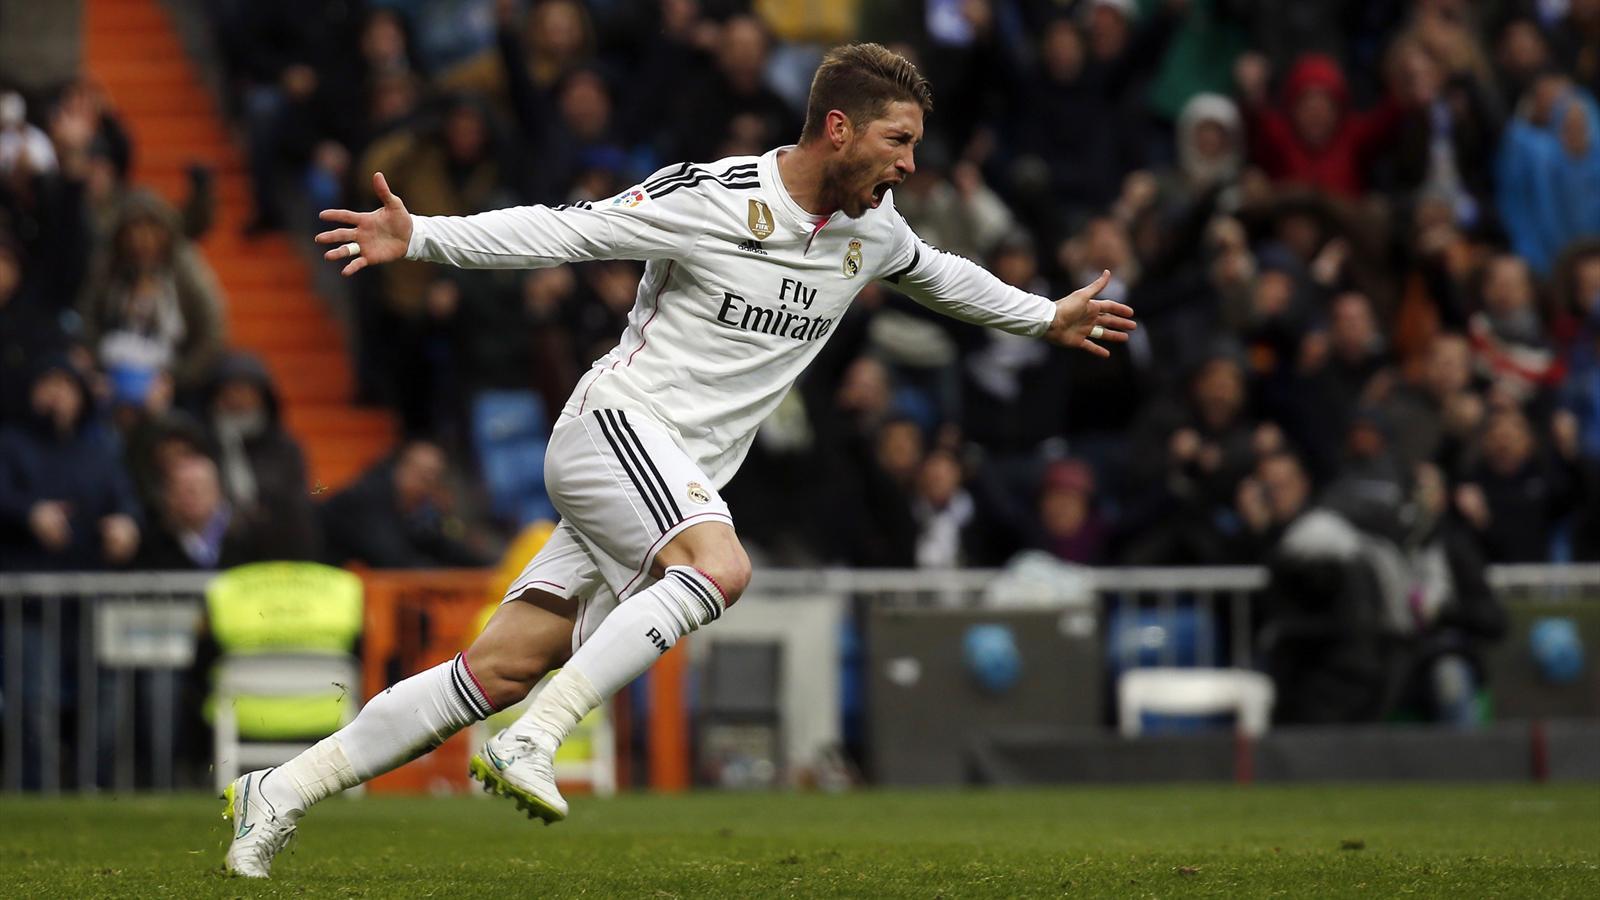 Sergio Ramos Soccer Real Madrid Stadium Soccer Pitches